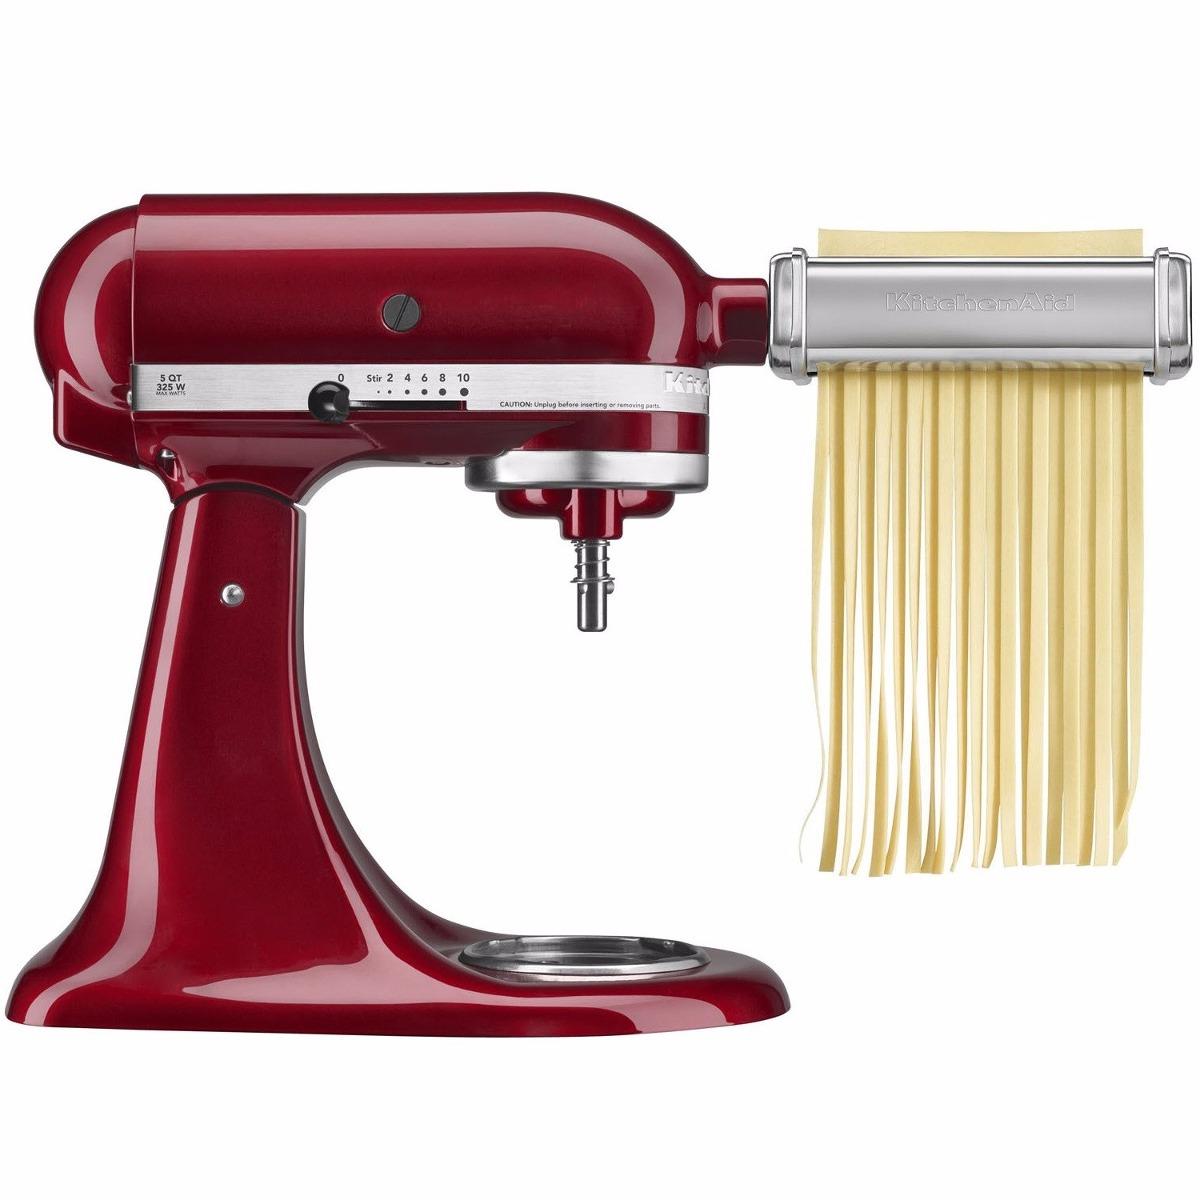 Acessório Set Pasta Roller Kitchenaid para Batedeira